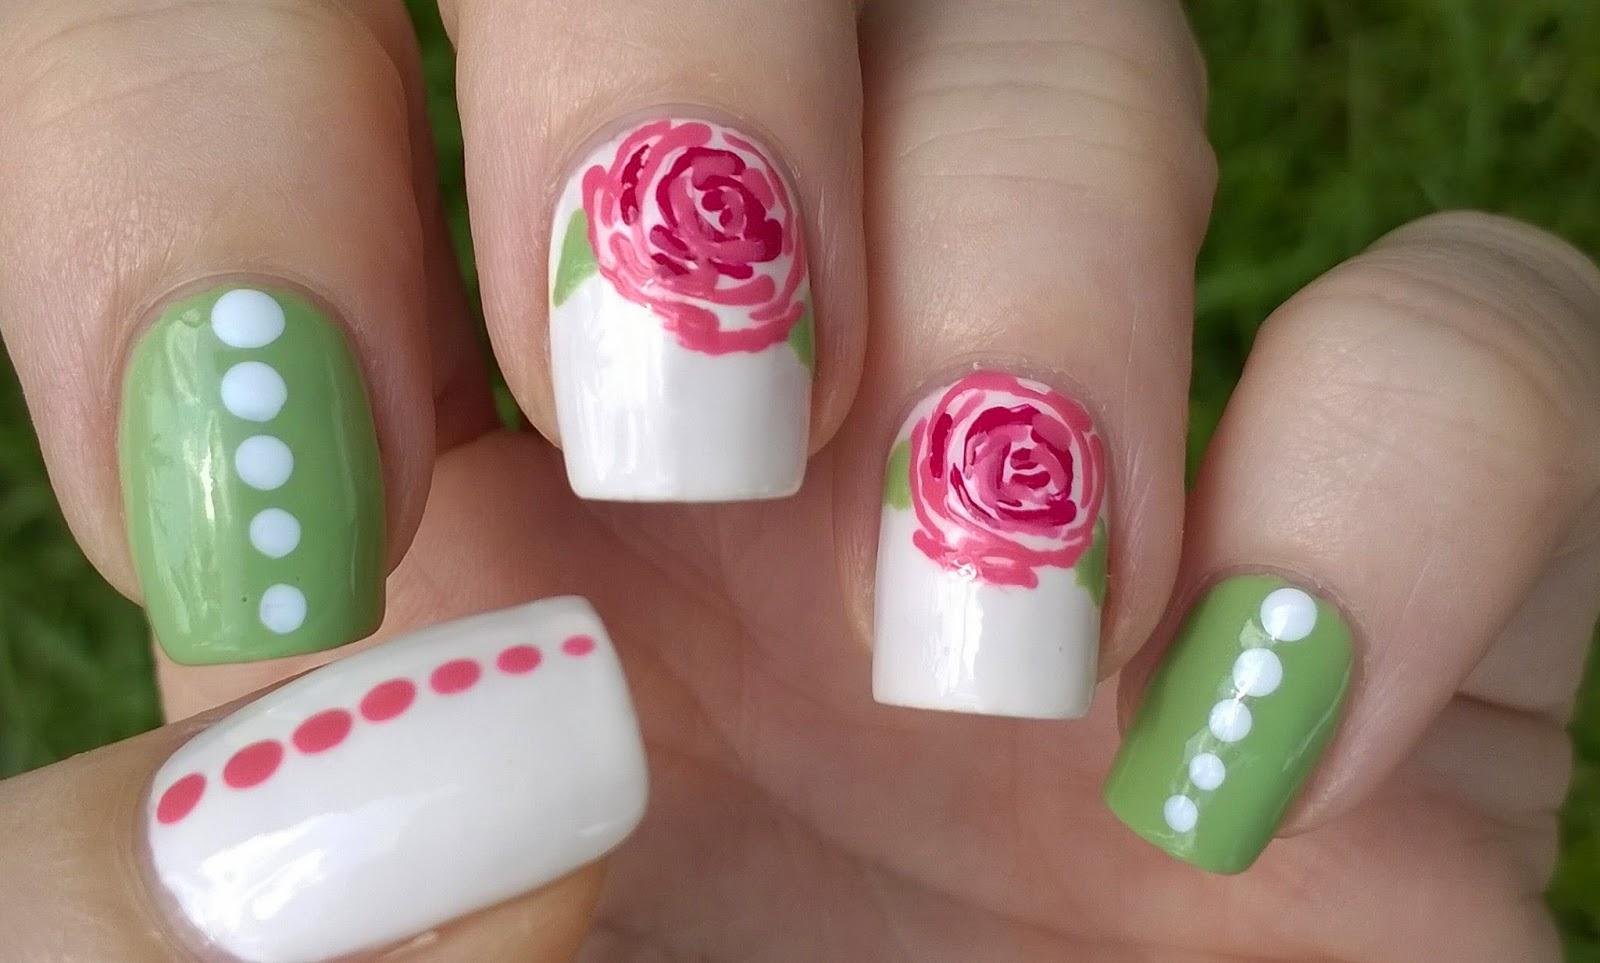 Life World Women: Romantic Rose Nail Art